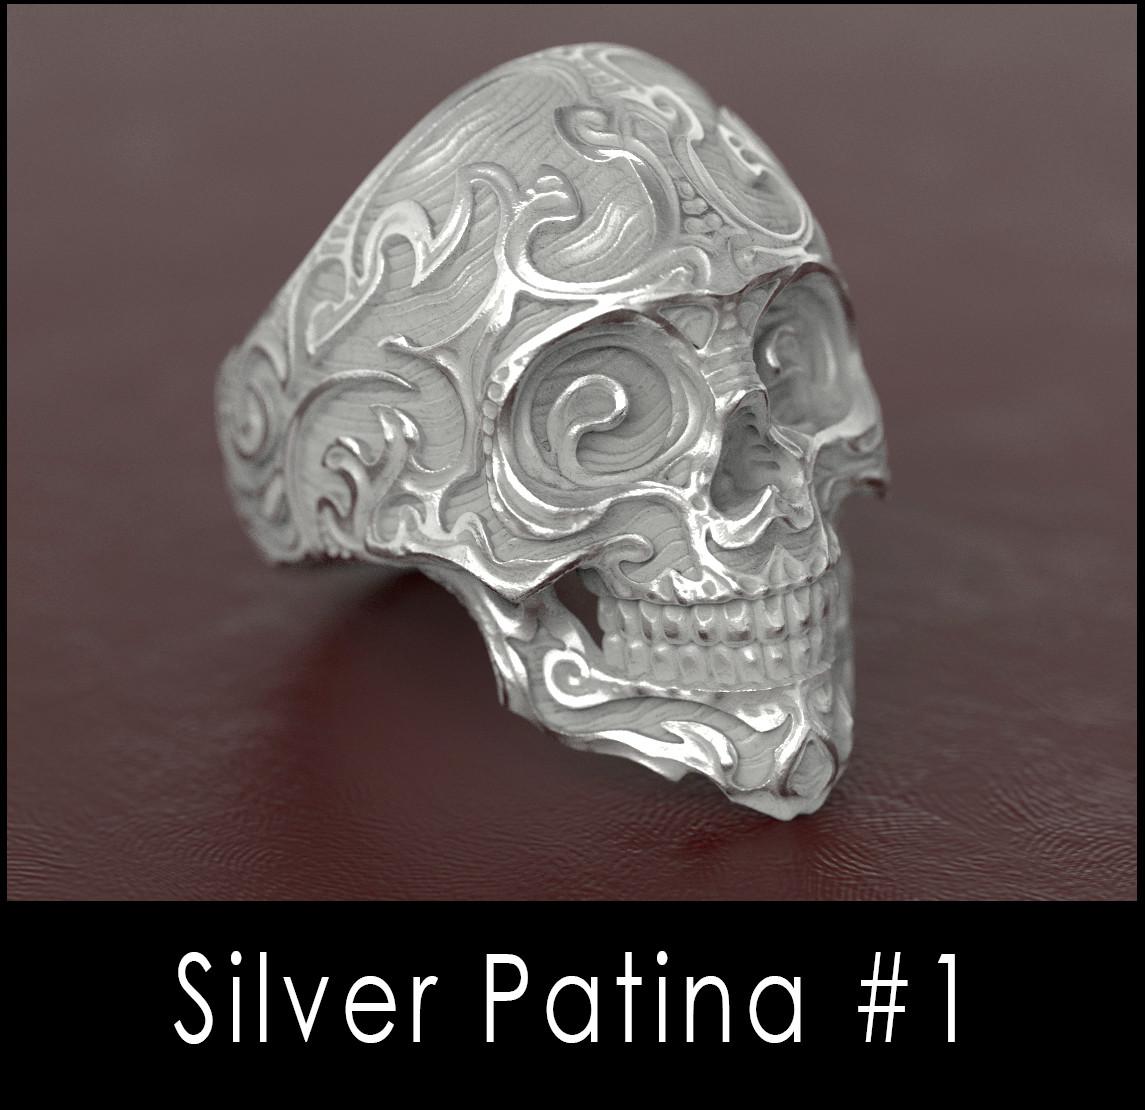 Nacho riesco gostanza silver patina n1